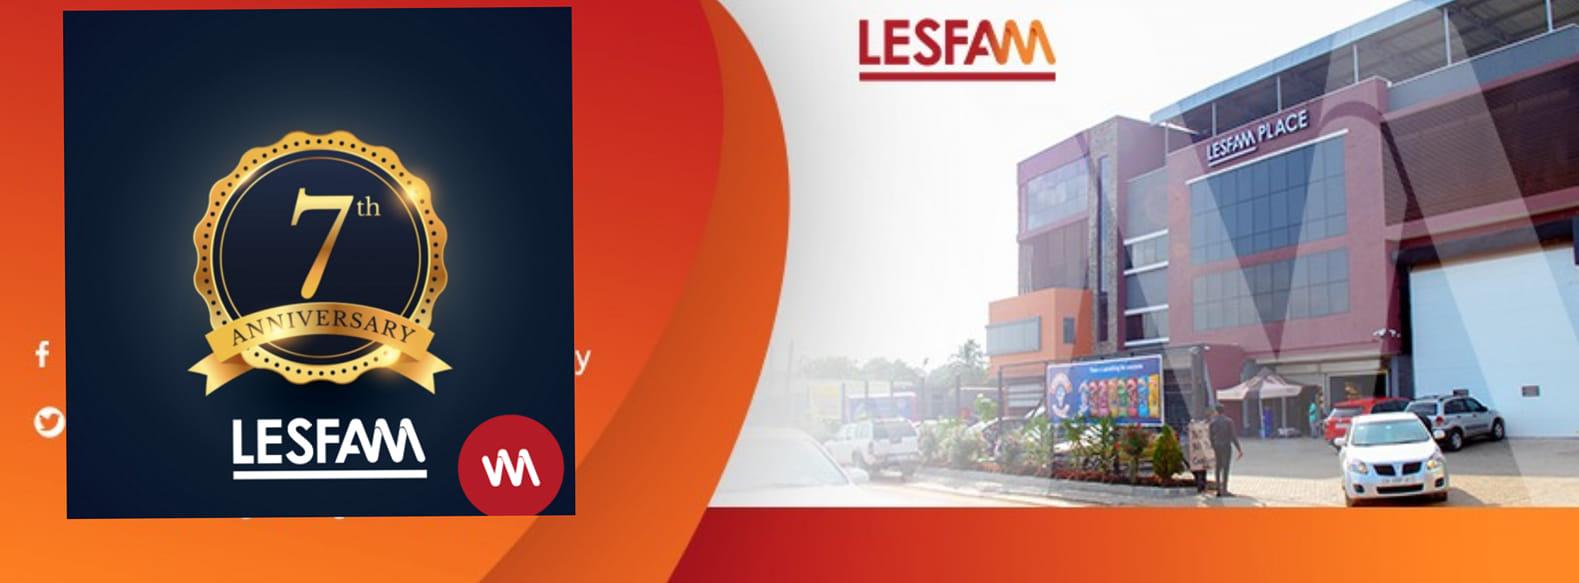 LESFAM COMPANY LTD CELEBRATES 7TH ANNIVERSARY WITH MINI PARTY.